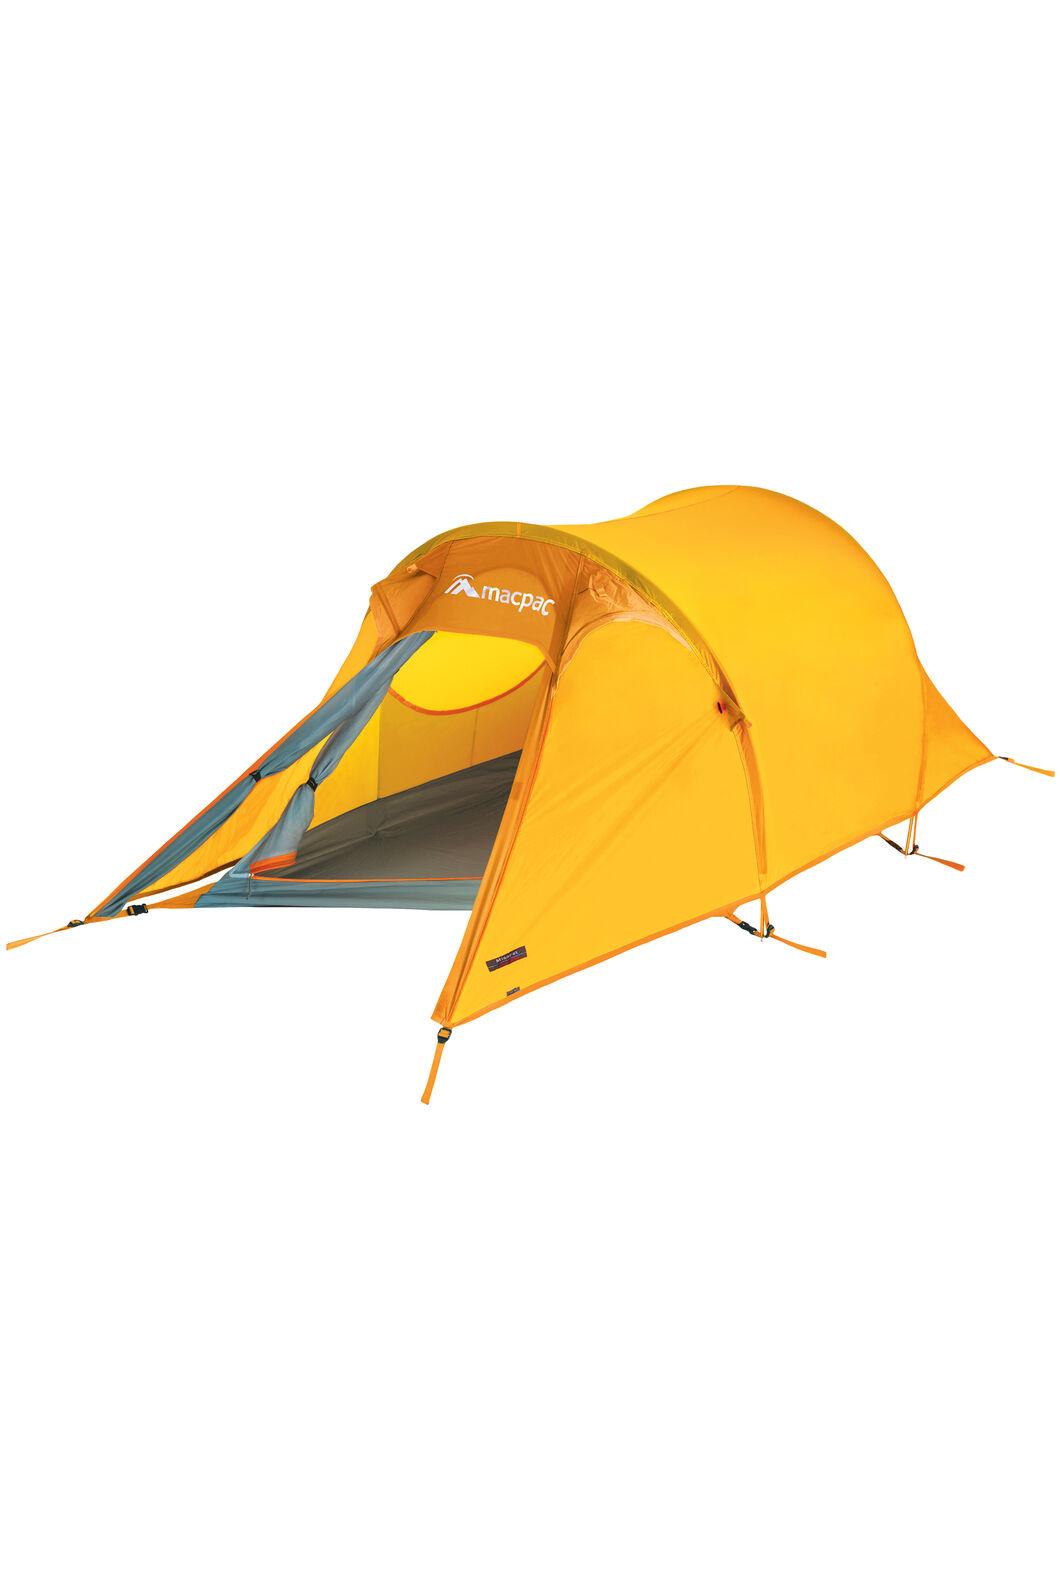 Macpac Minaret Hiking Tent, Spectra Yellow, hi-res